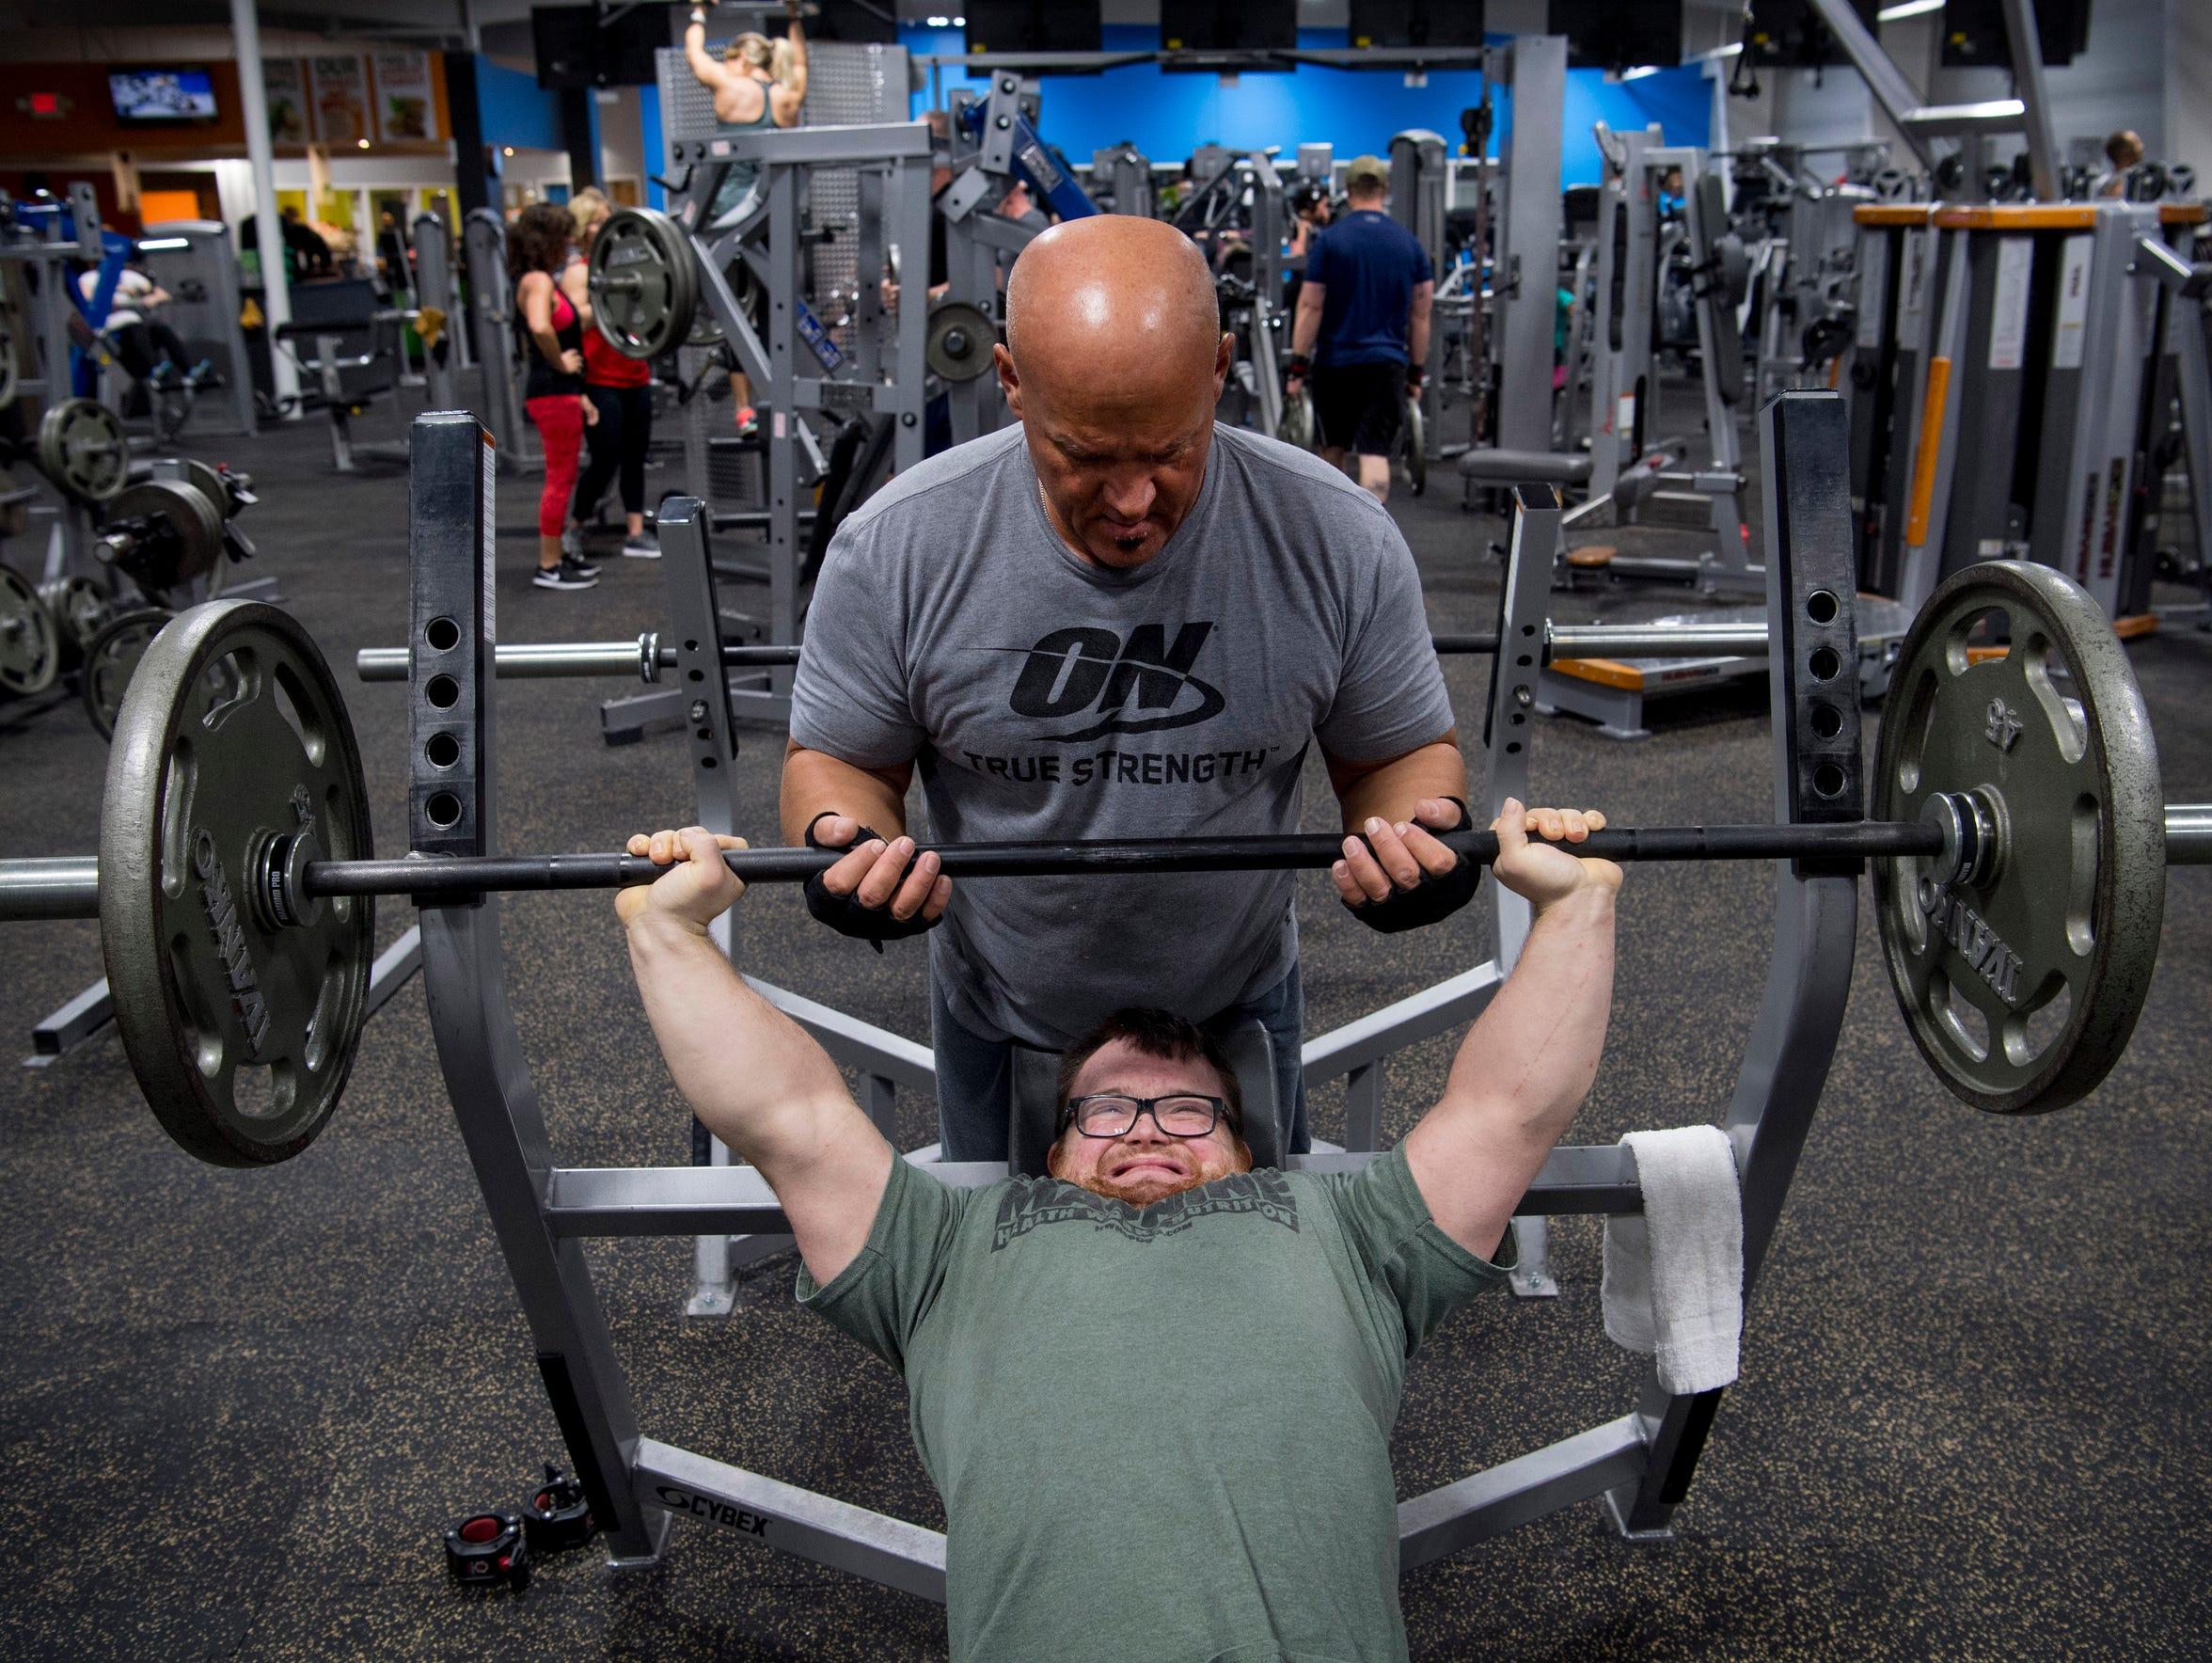 Coach, friend and training partner Jeff Kosor spots